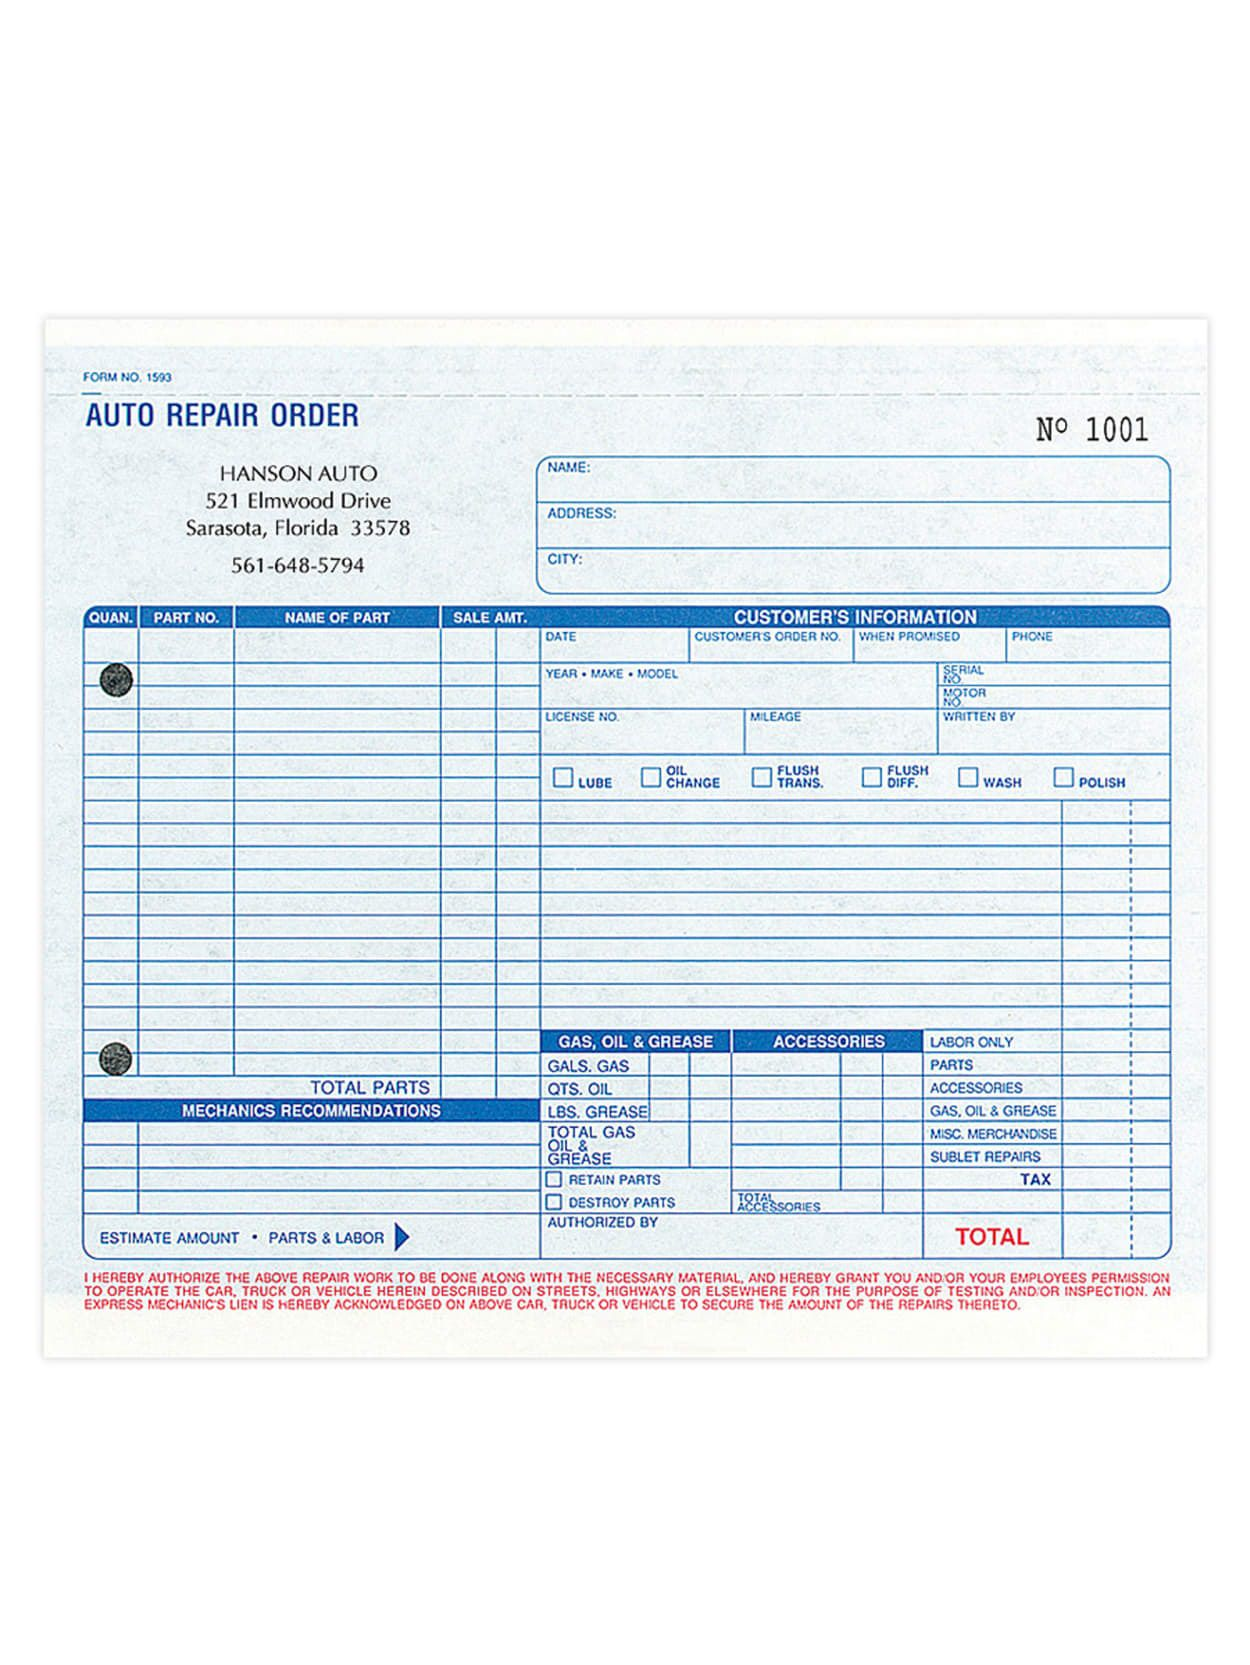 004 Amazing Auto Repair Work Order Template Excel Free Example Full